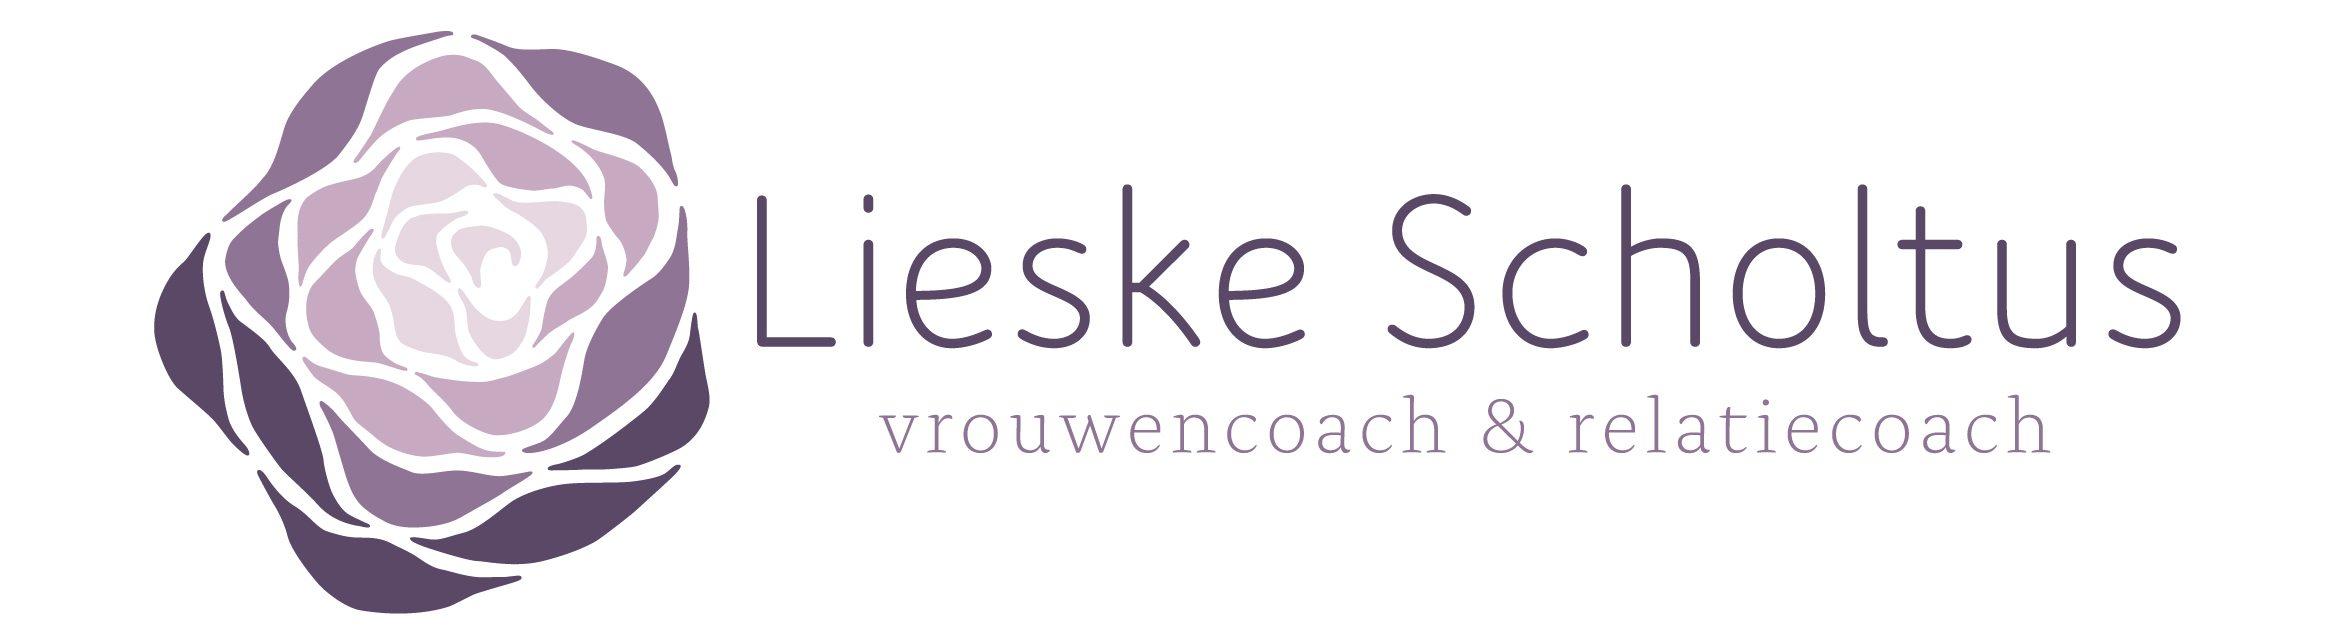 Lieske Scholtus – (outdoor) vrouwencoach & relatiecoach